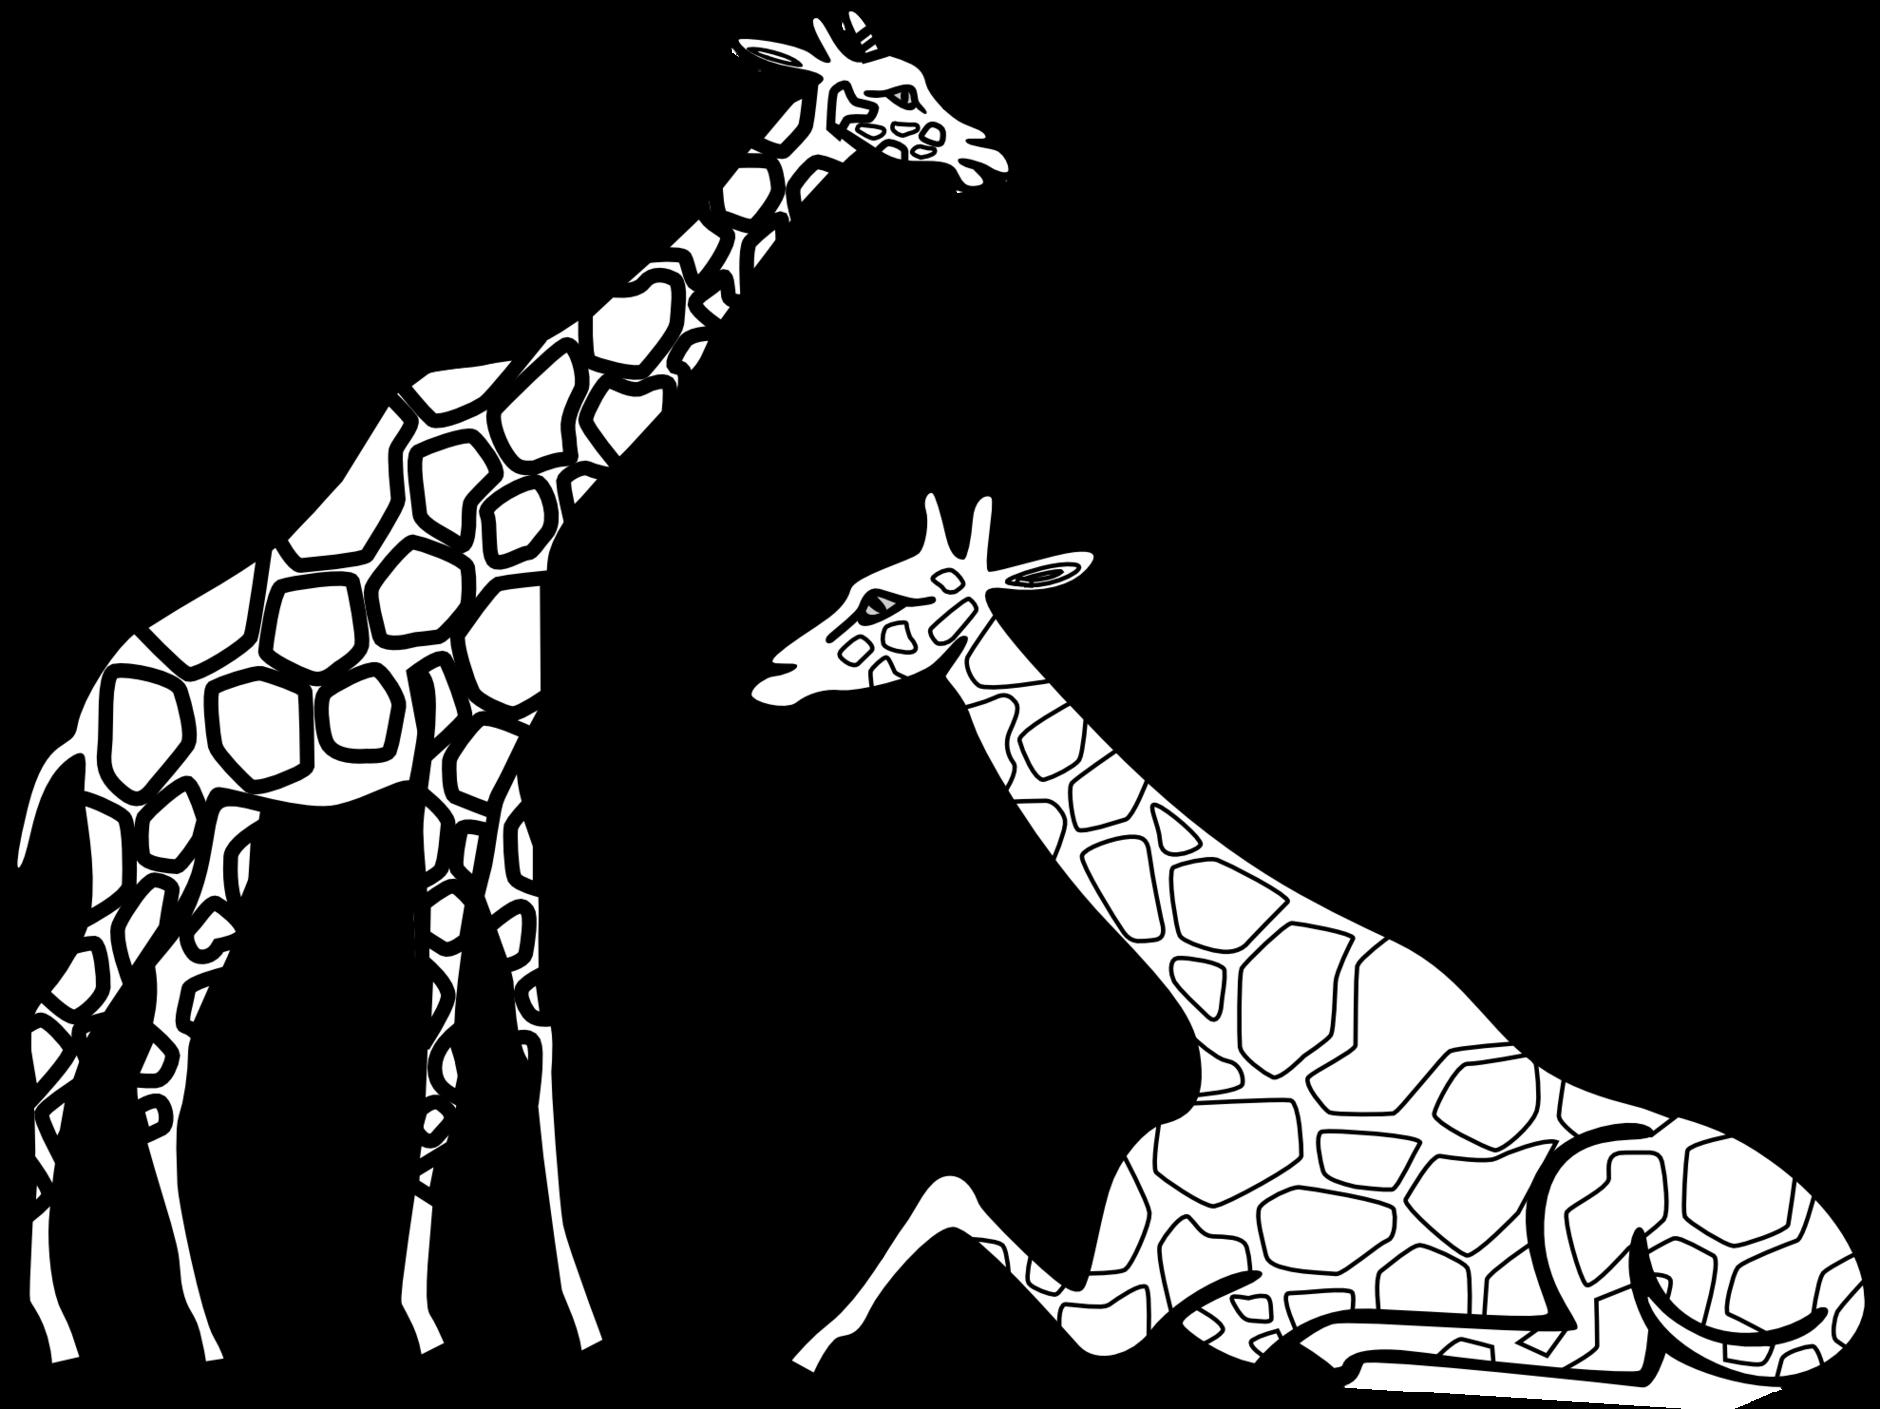 Giraffe Outlines Printable.